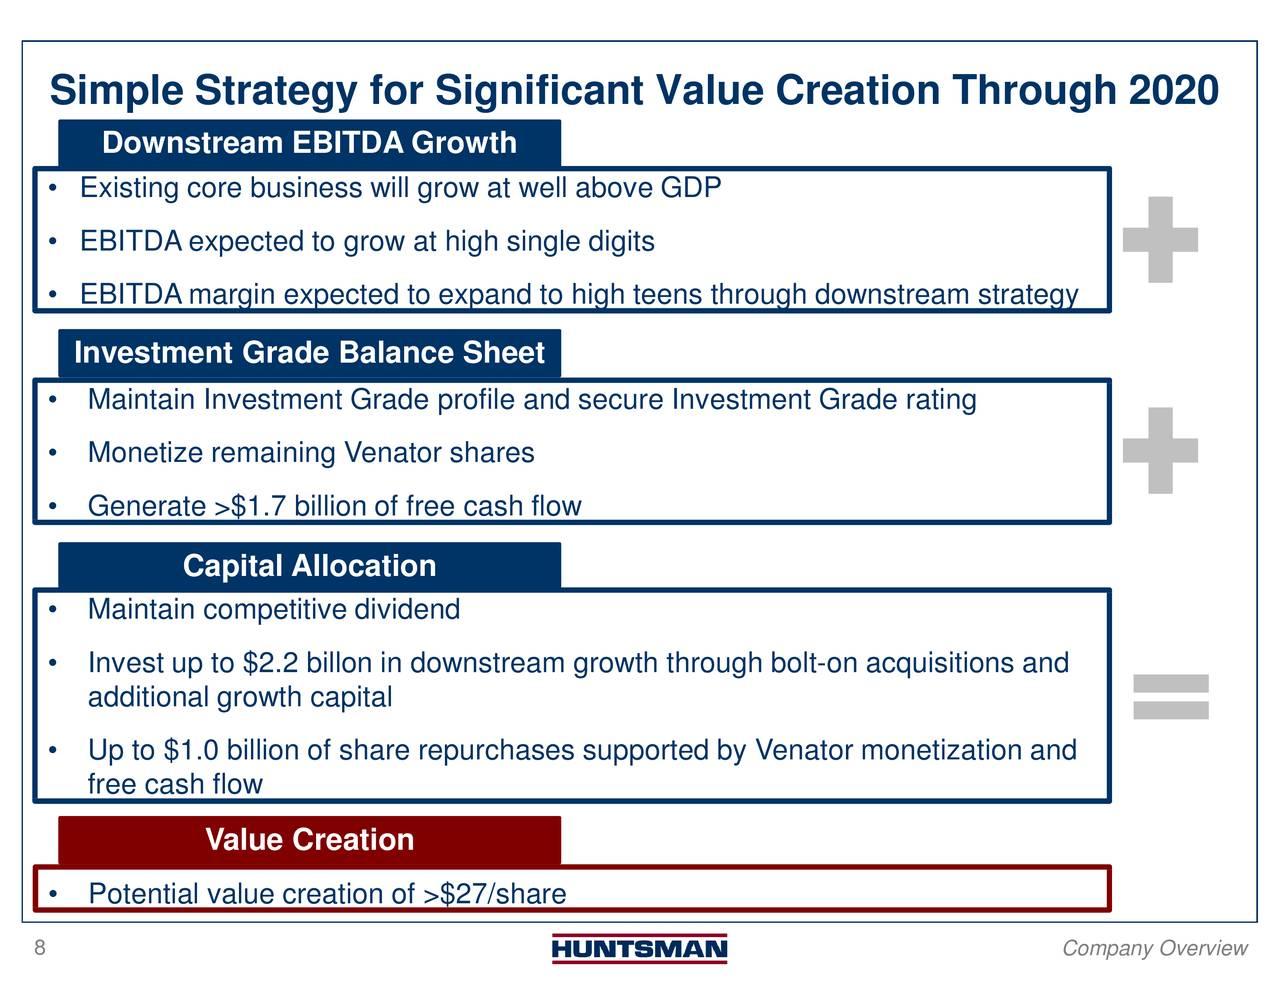 Huntsman (HUN) Investor Presentation - Slideshow - Huntsman